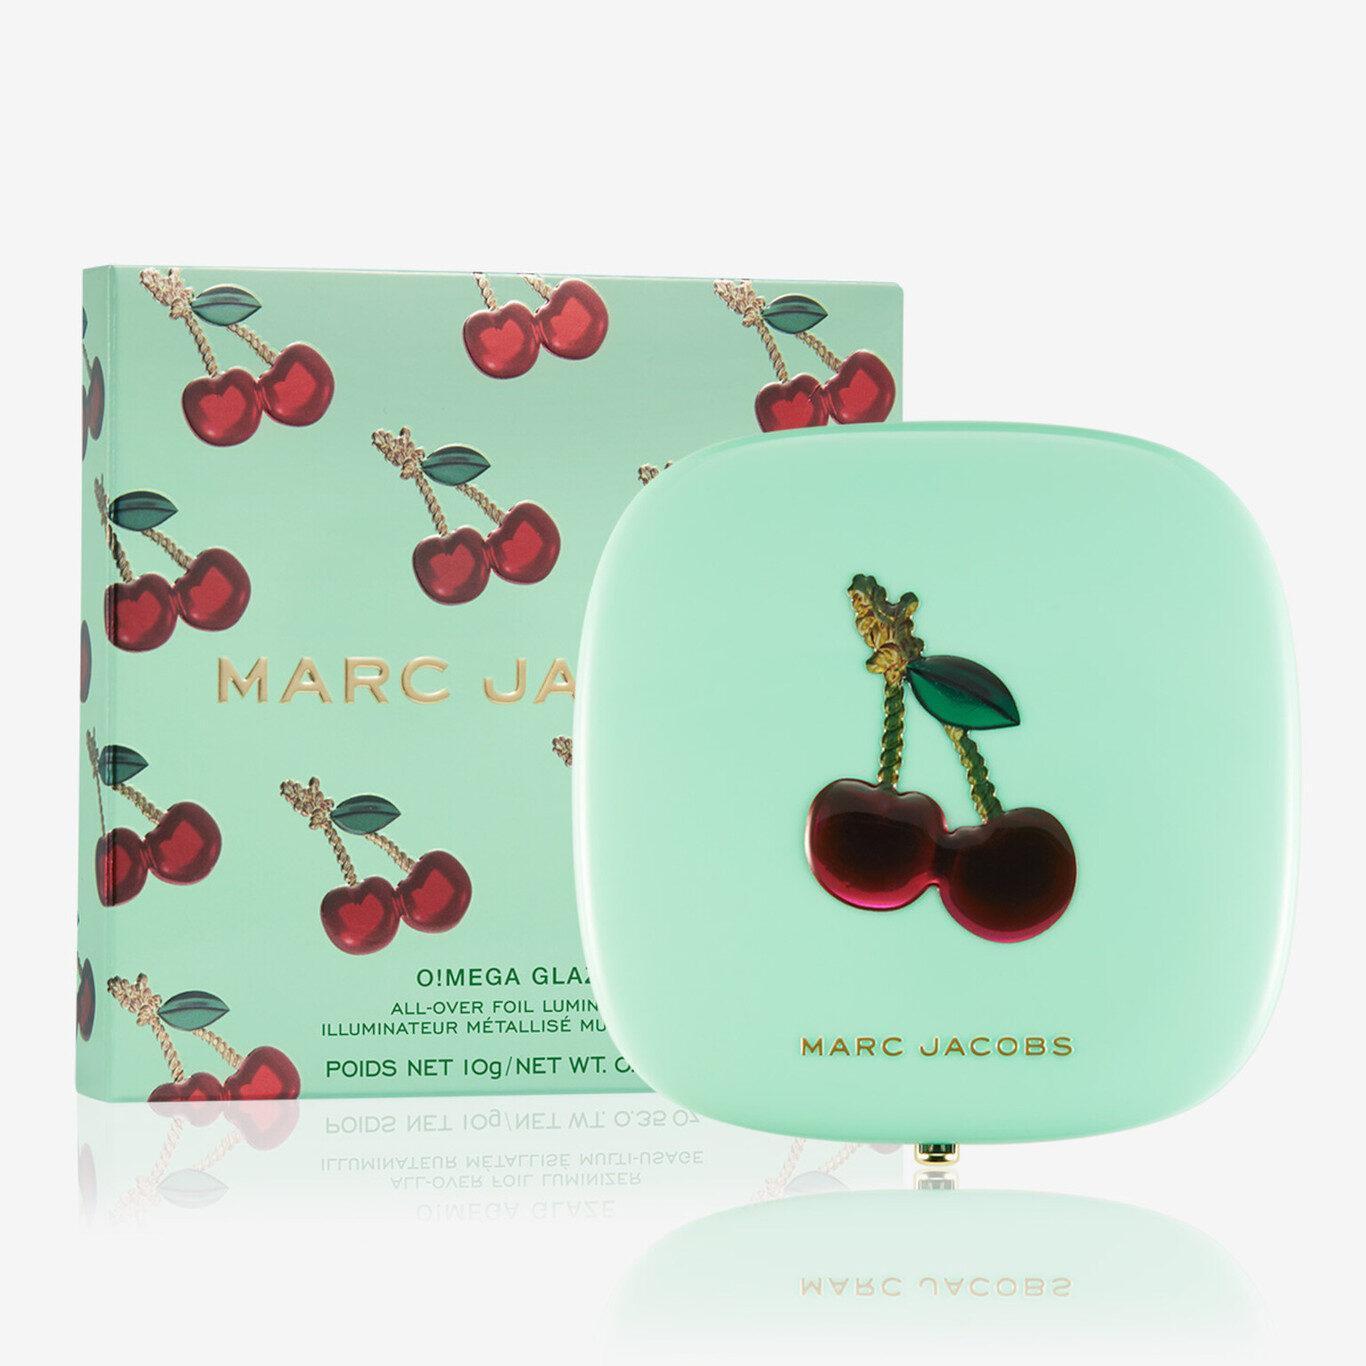 Marc Jacobs Very Merry Cherry O!mega Glaze All Over Foil Luminizer Very Merry Cherry Edition Cover